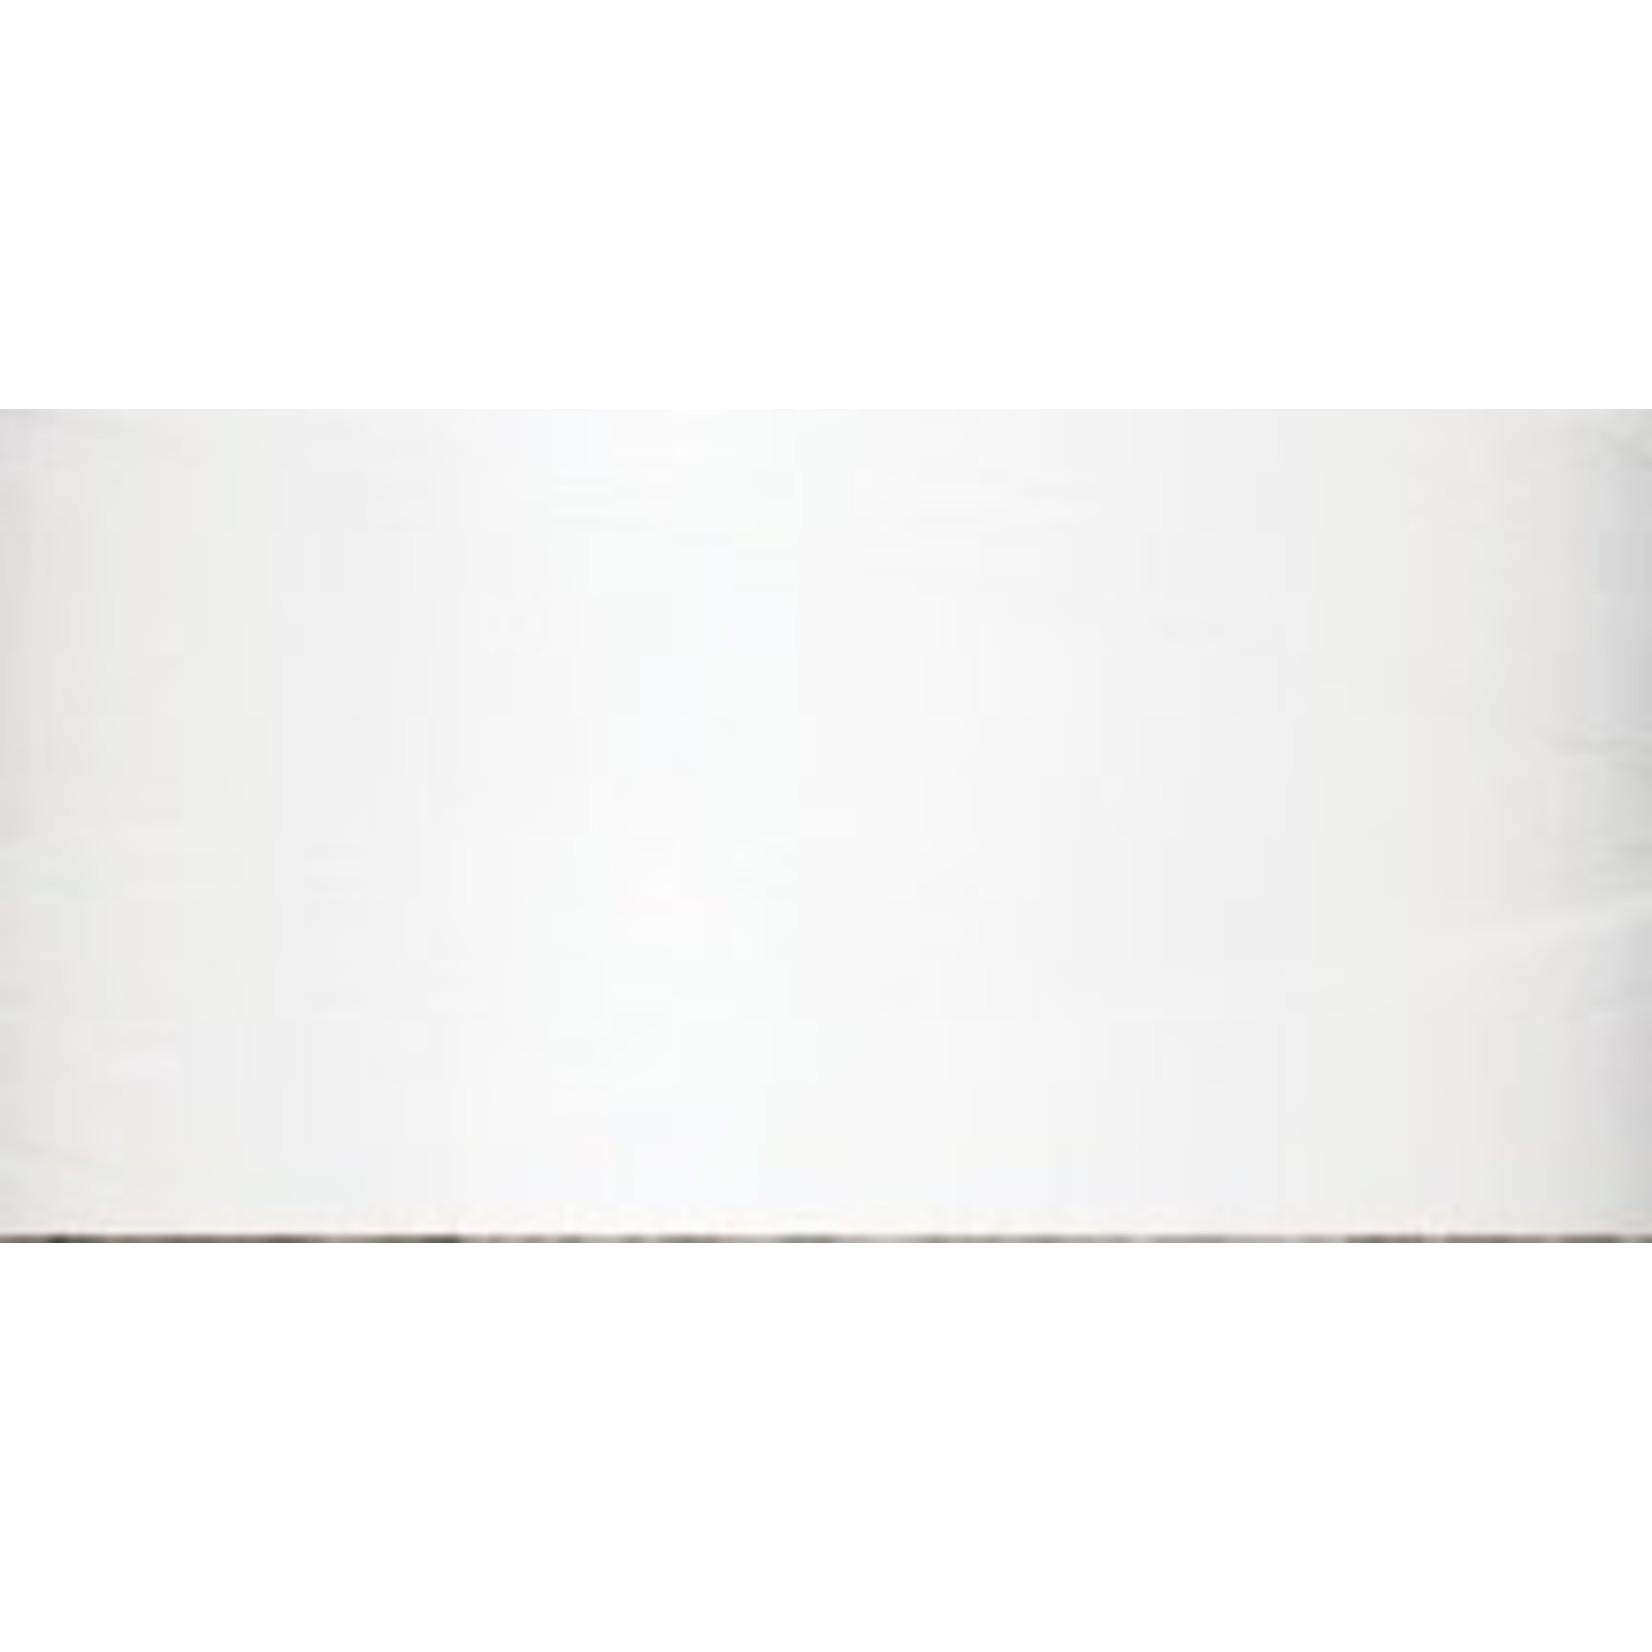 Superior Threads Bottom Line - #60 - 1300 m - 655 Off White